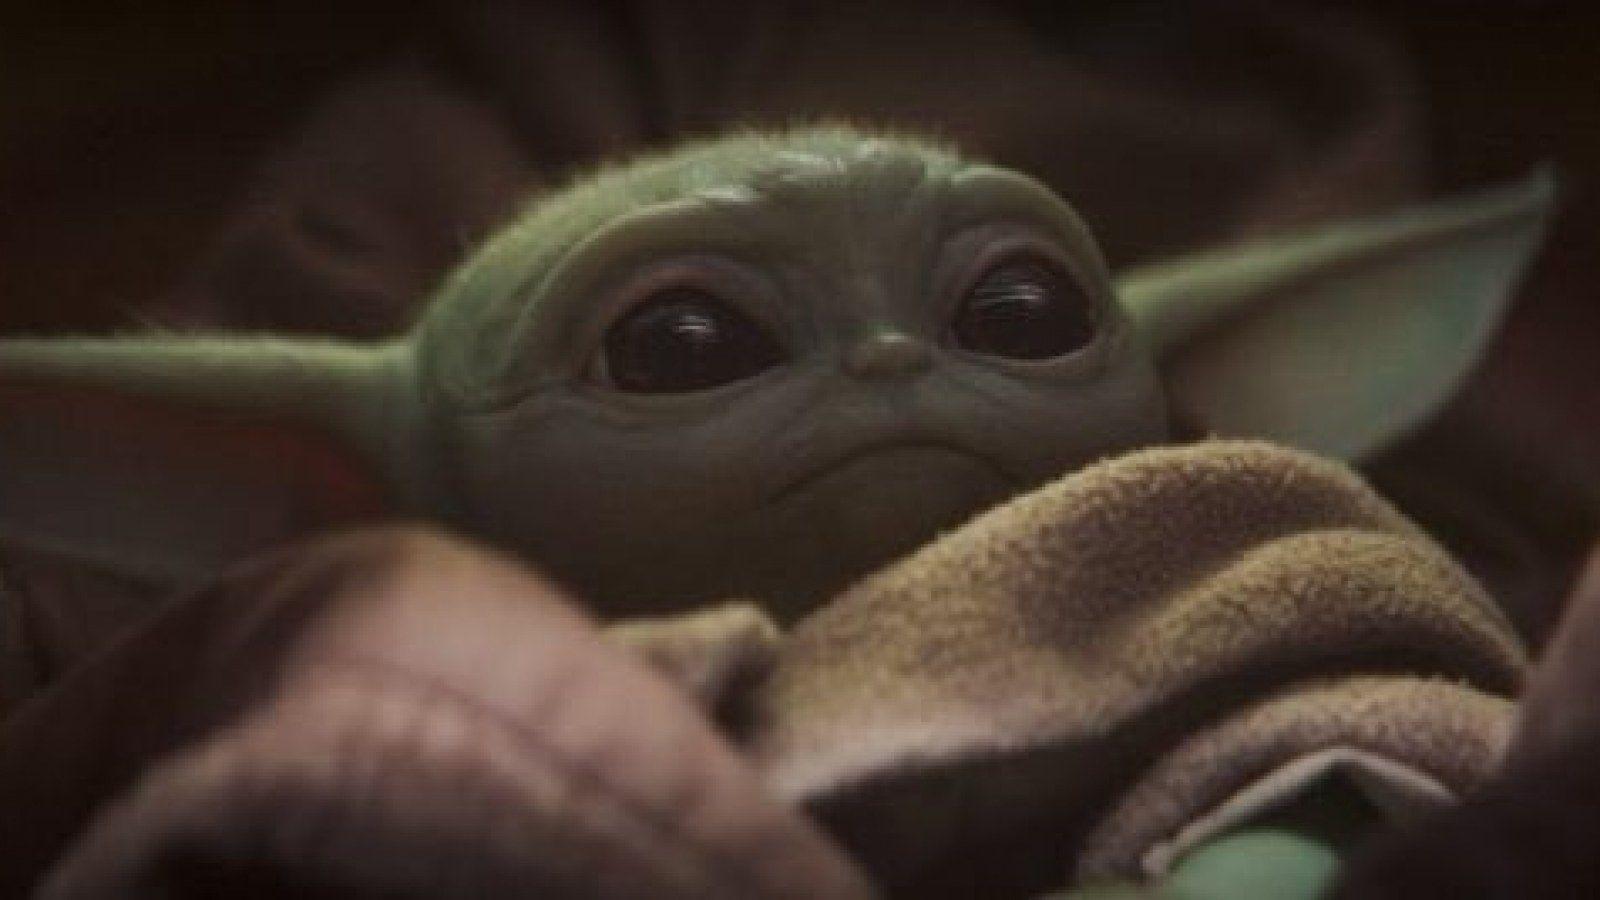 Baby Yoda 4k Wallpapers Top Free Baby Yoda 4k Backgrounds Wallpaperaccess